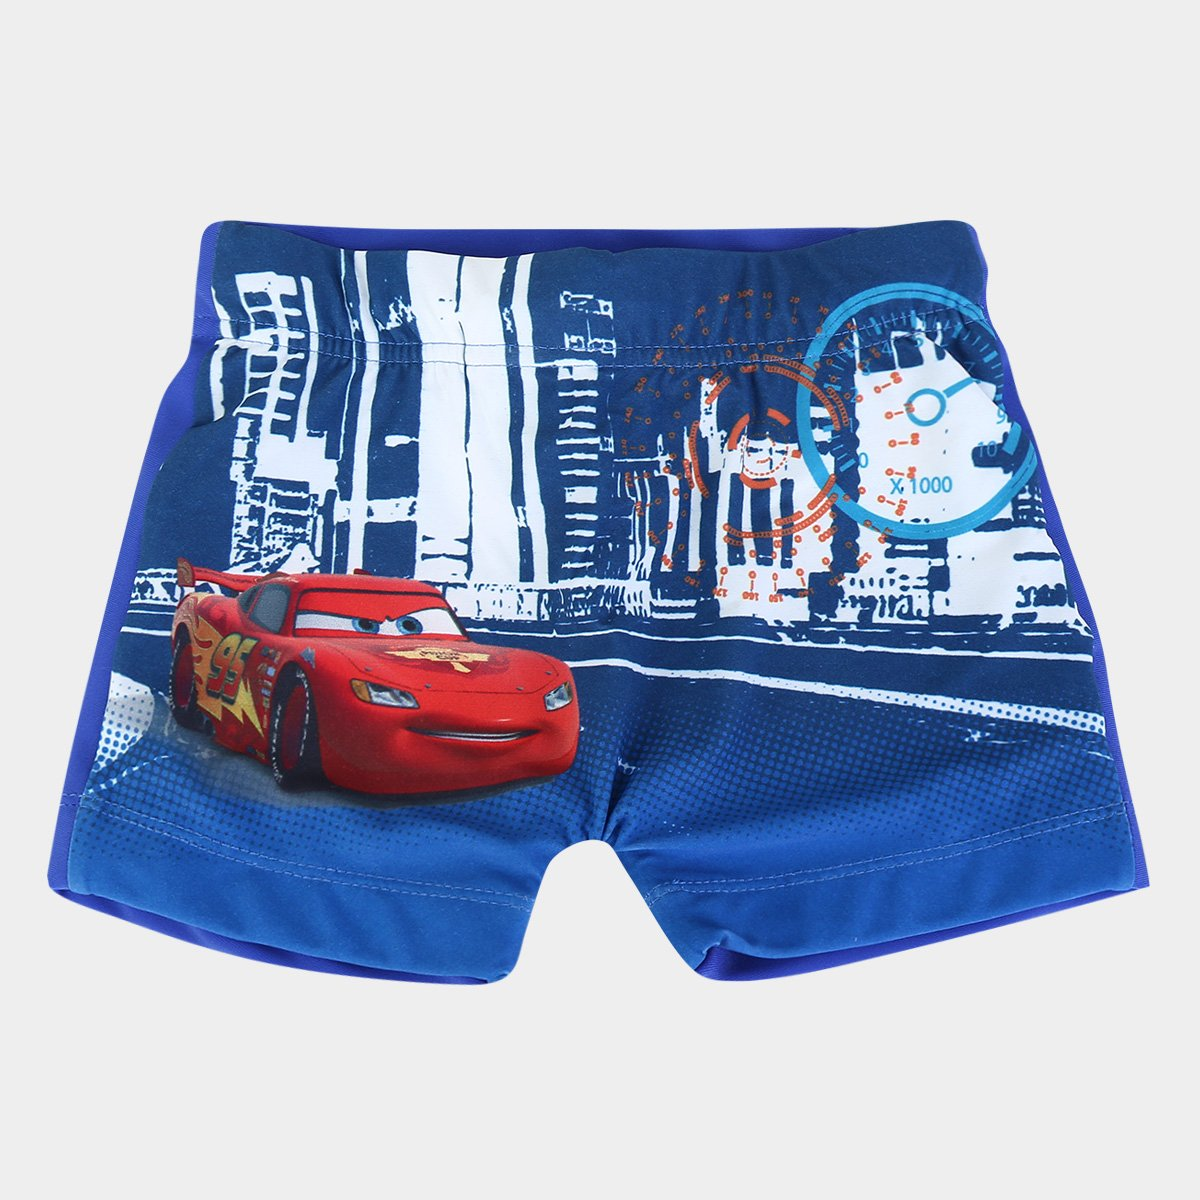 Sunga Infantil Tip Top Boxer Carros